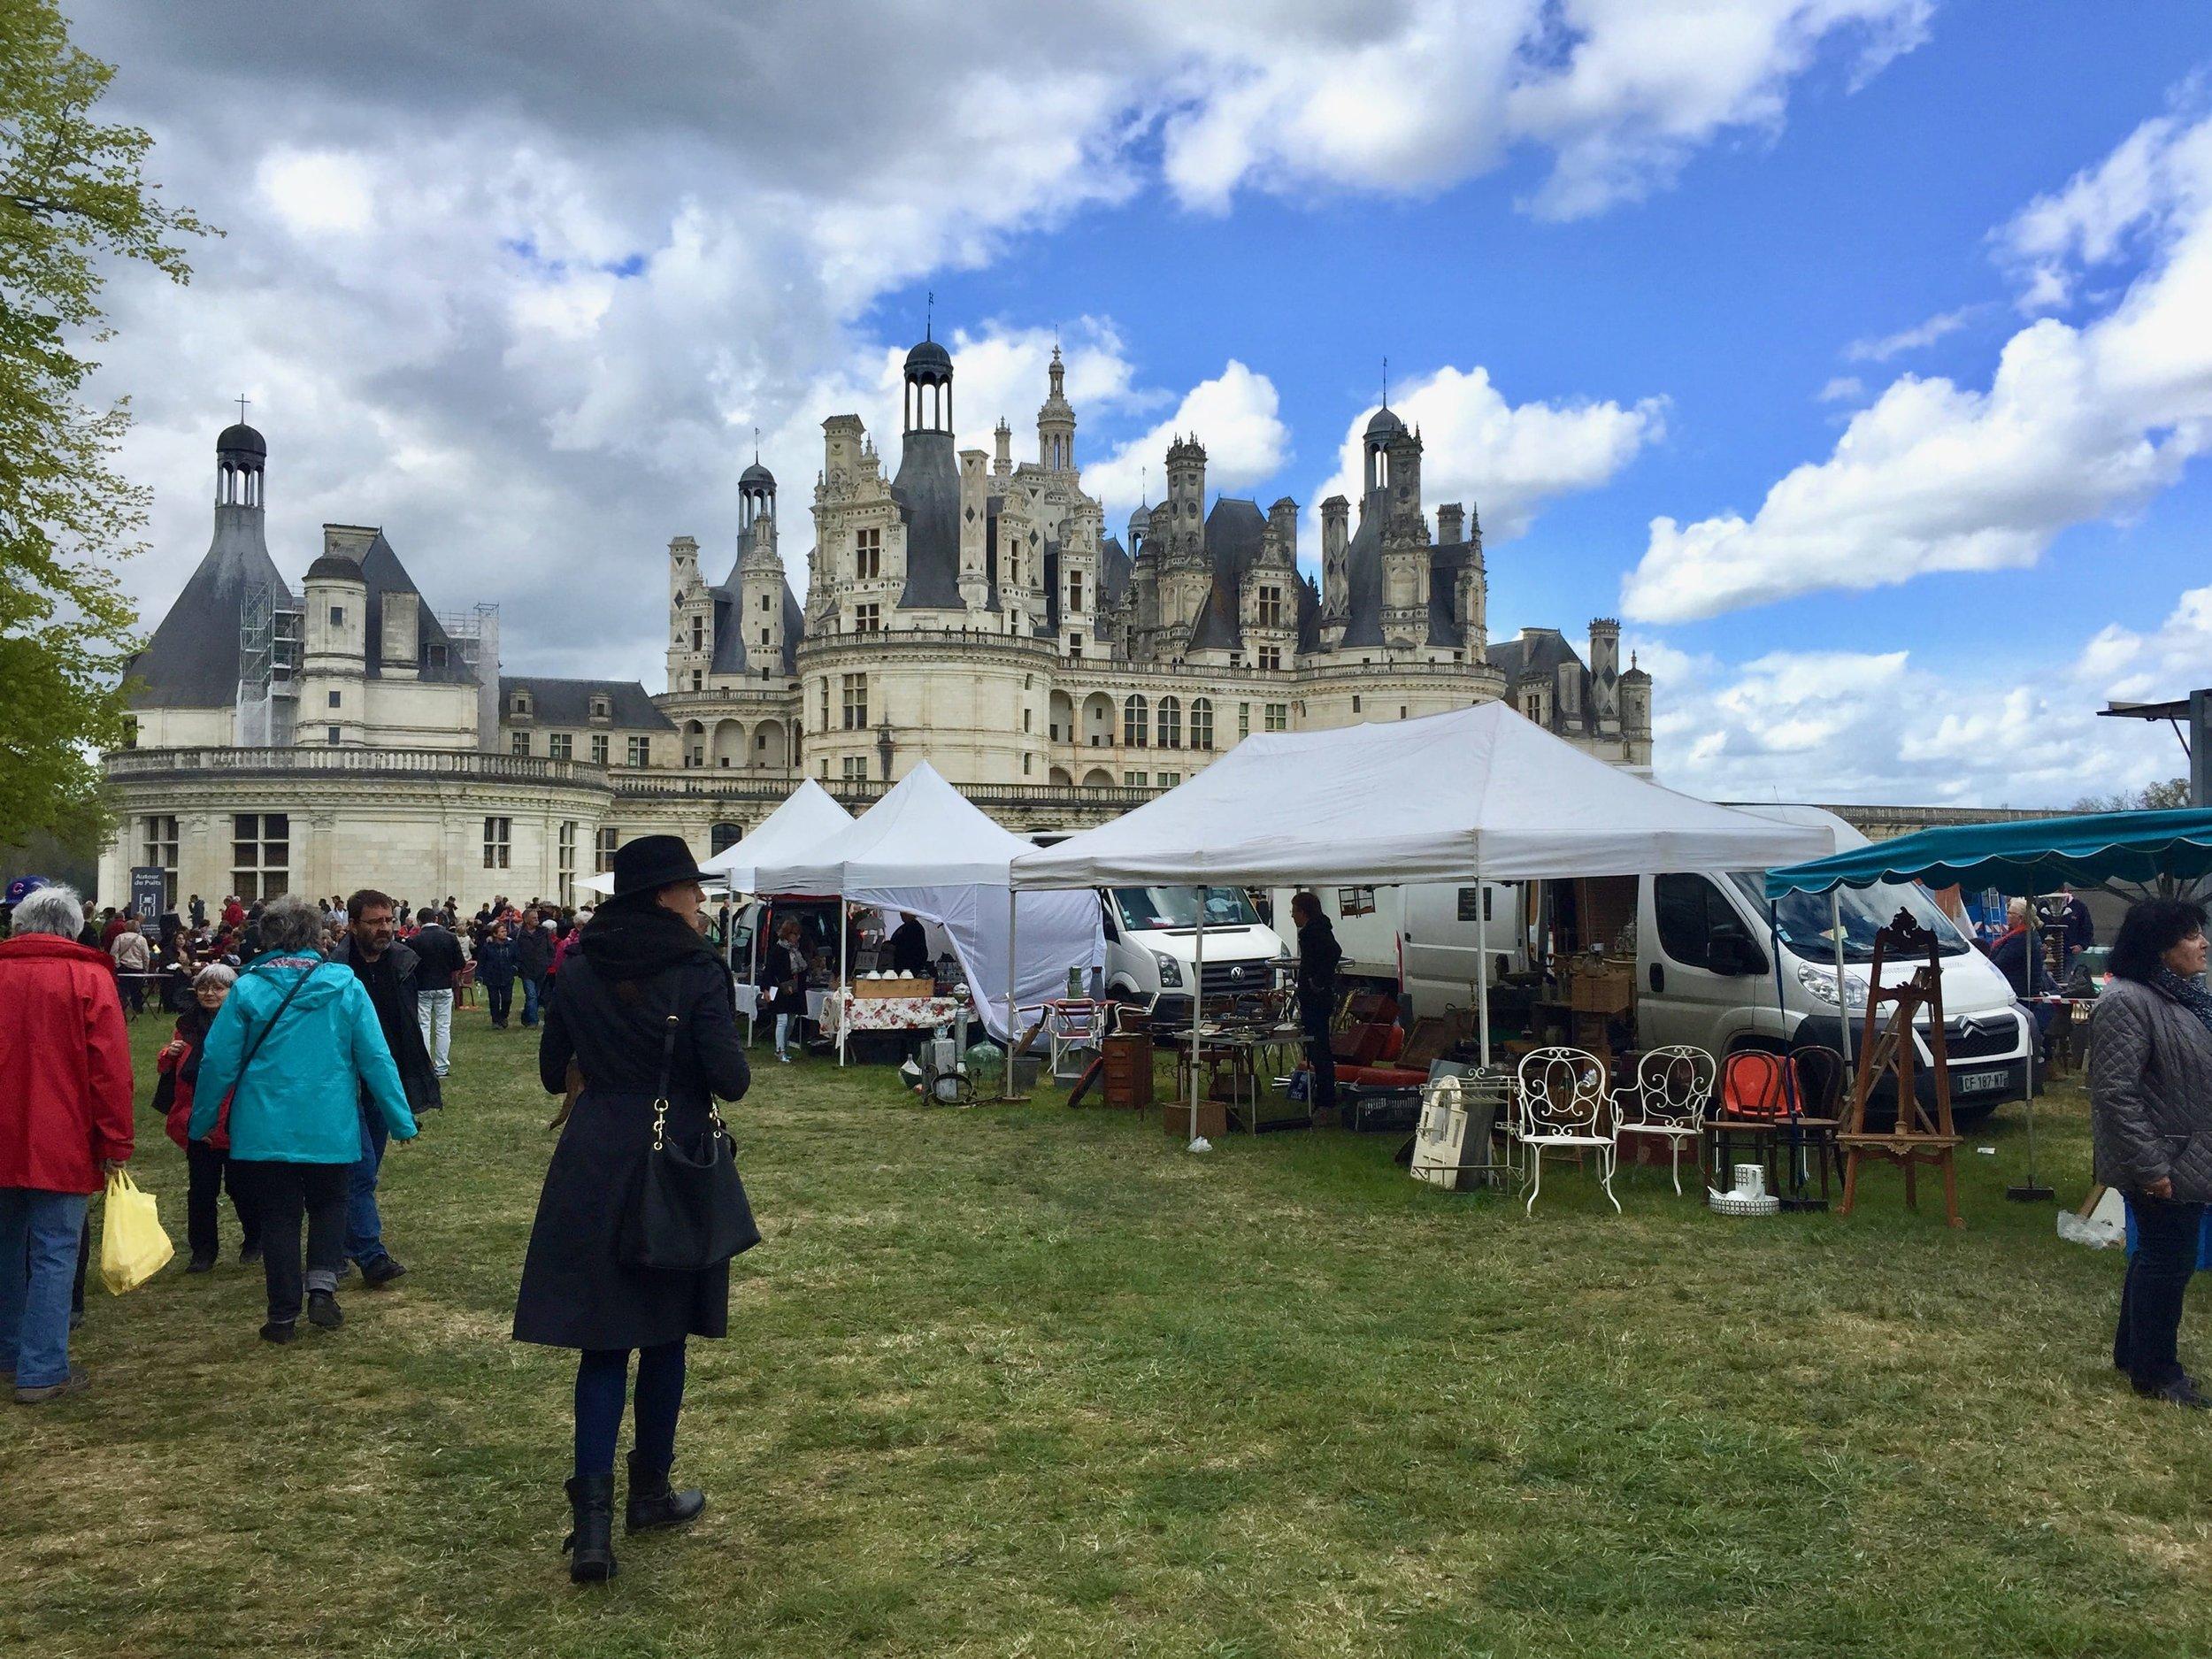 chateau grounds 1-min.jpg